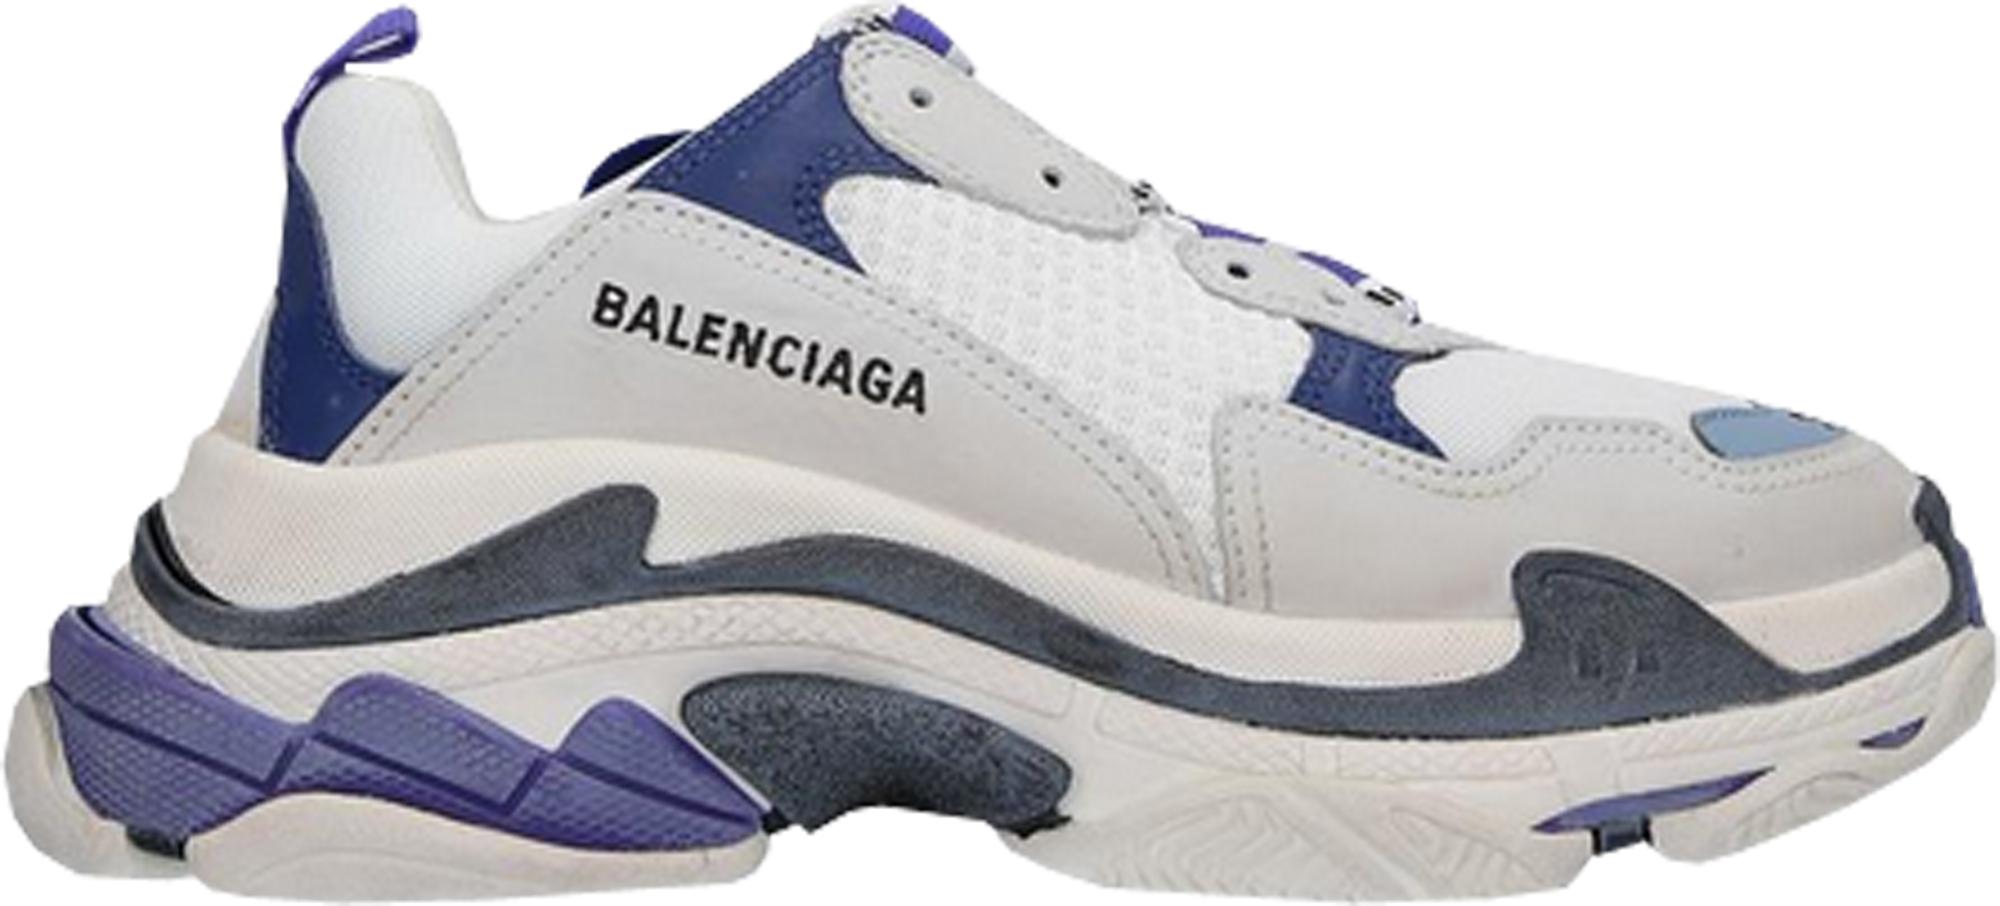 Balenciaga Triple S Xanh vang dxanh Giay adidas ngon